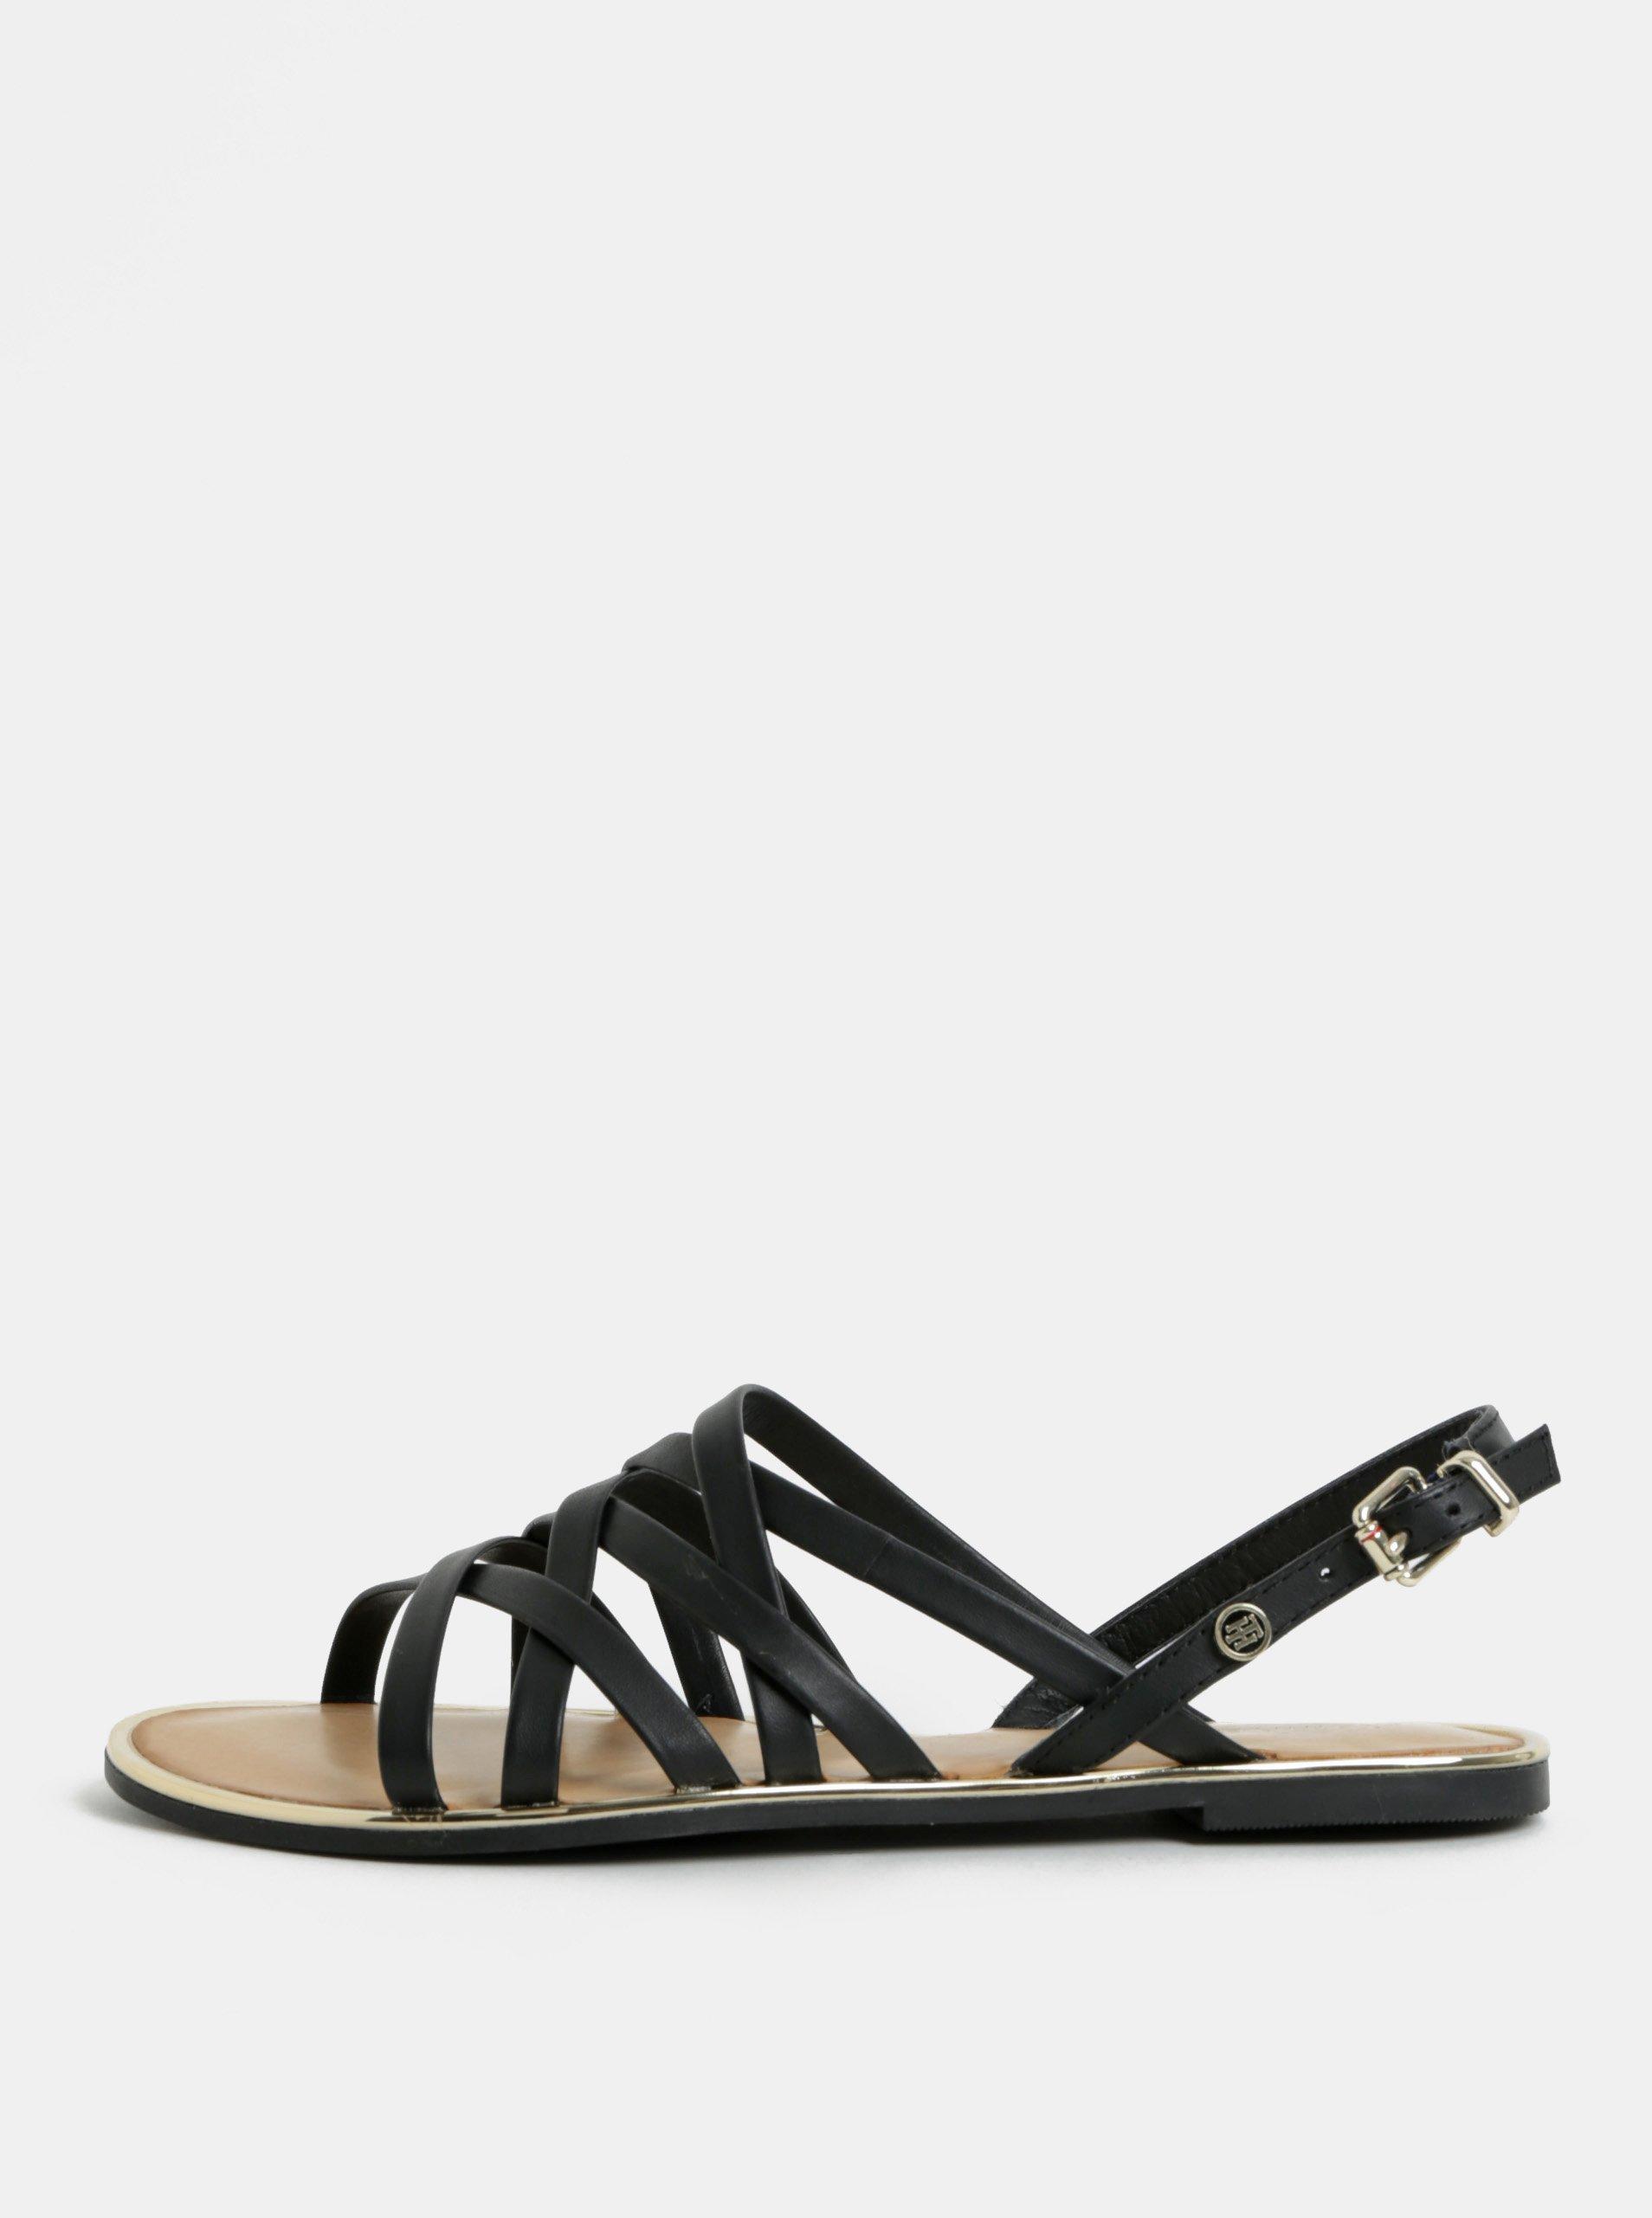 9b9e584438a1 Čierne dámske kožené sandále Tommy Hilfiger